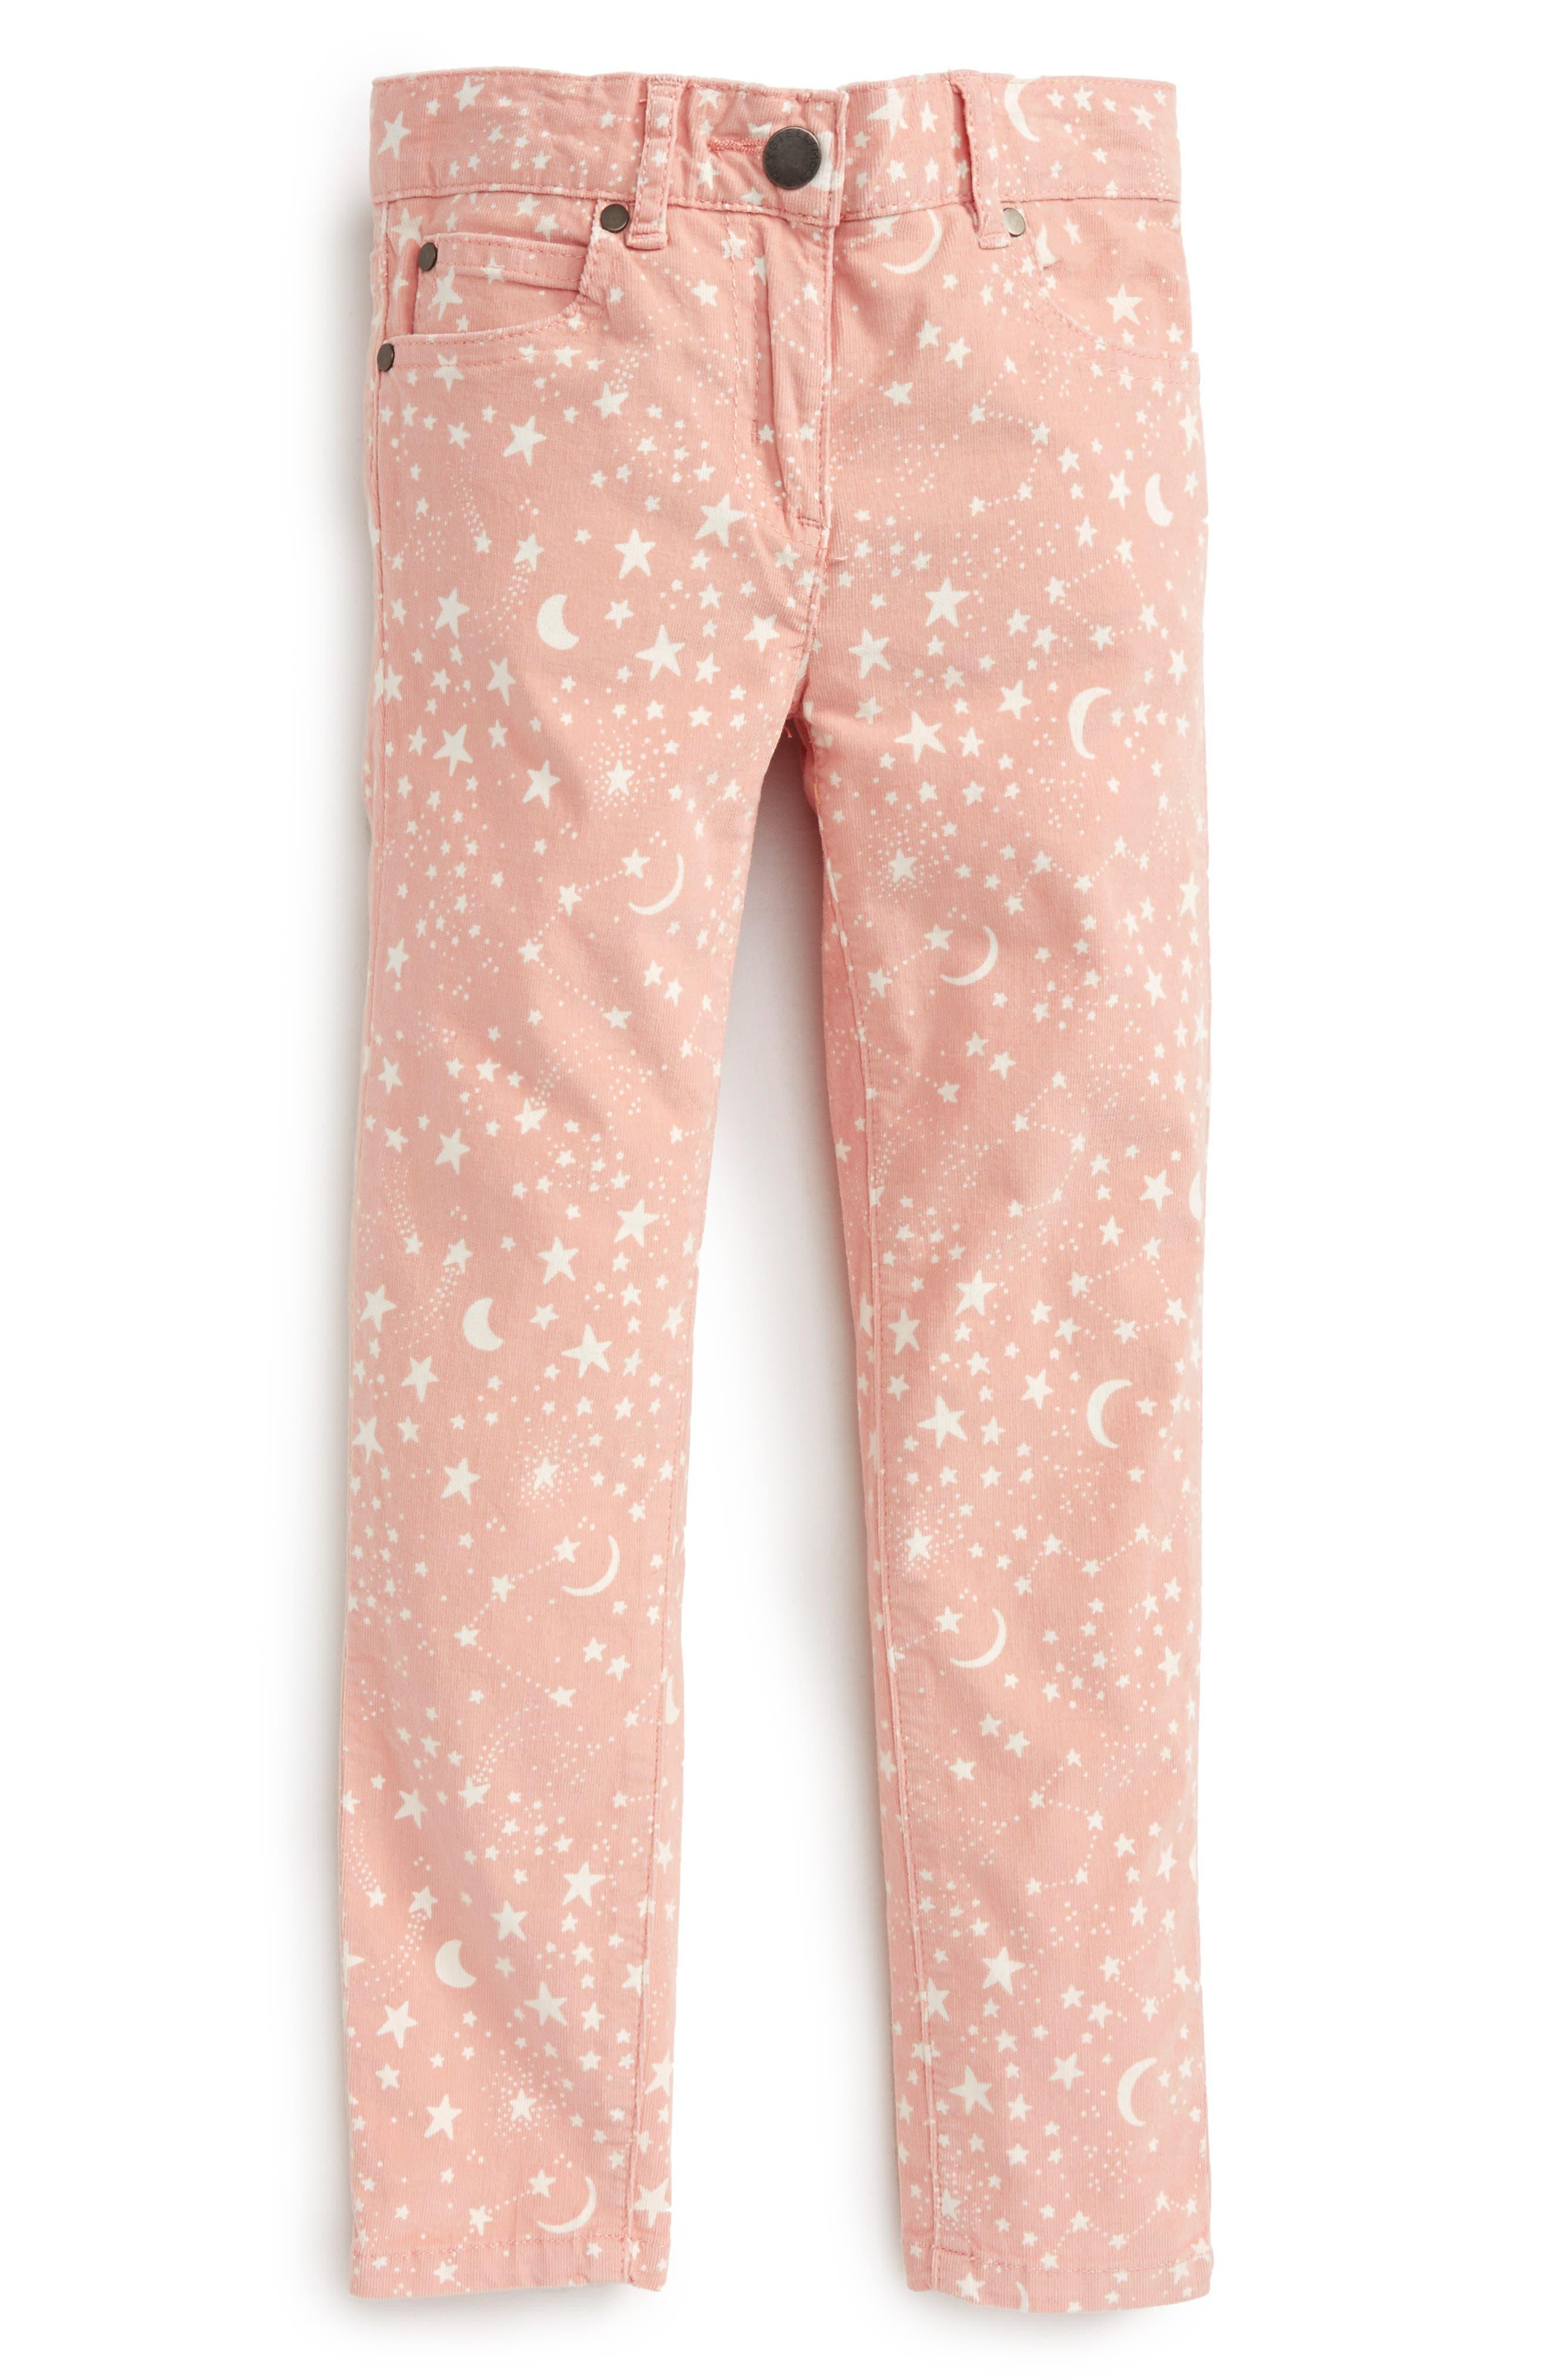 STELLA MCCARTNEY Kids Nina Star & Moon Print Skinny Corduroy Pants